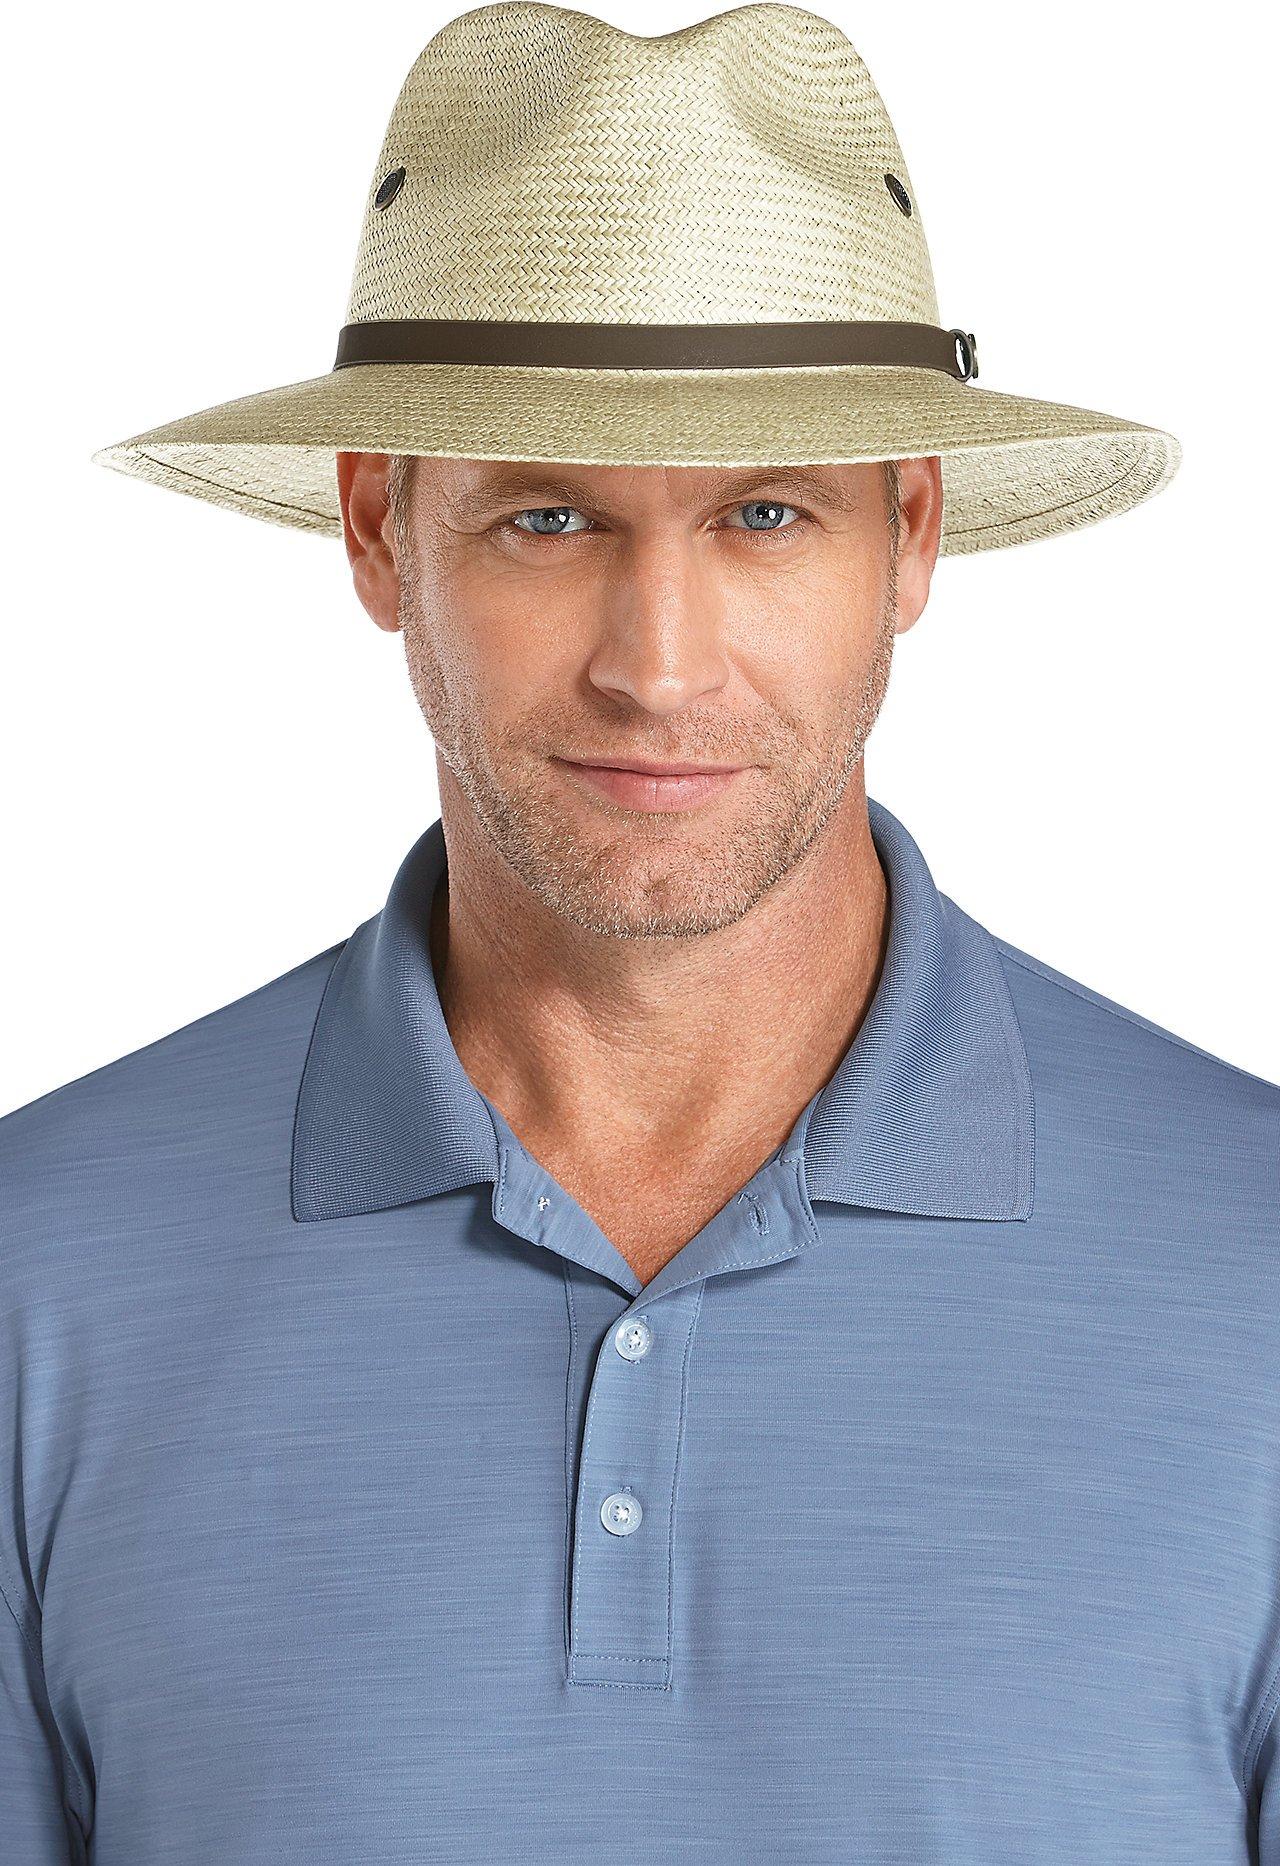 2ac9c813 Coolibar UPF 50+ Men's Fairway Golf Hat - Sun Protective (Large/X-Large-  Antique Ivory)